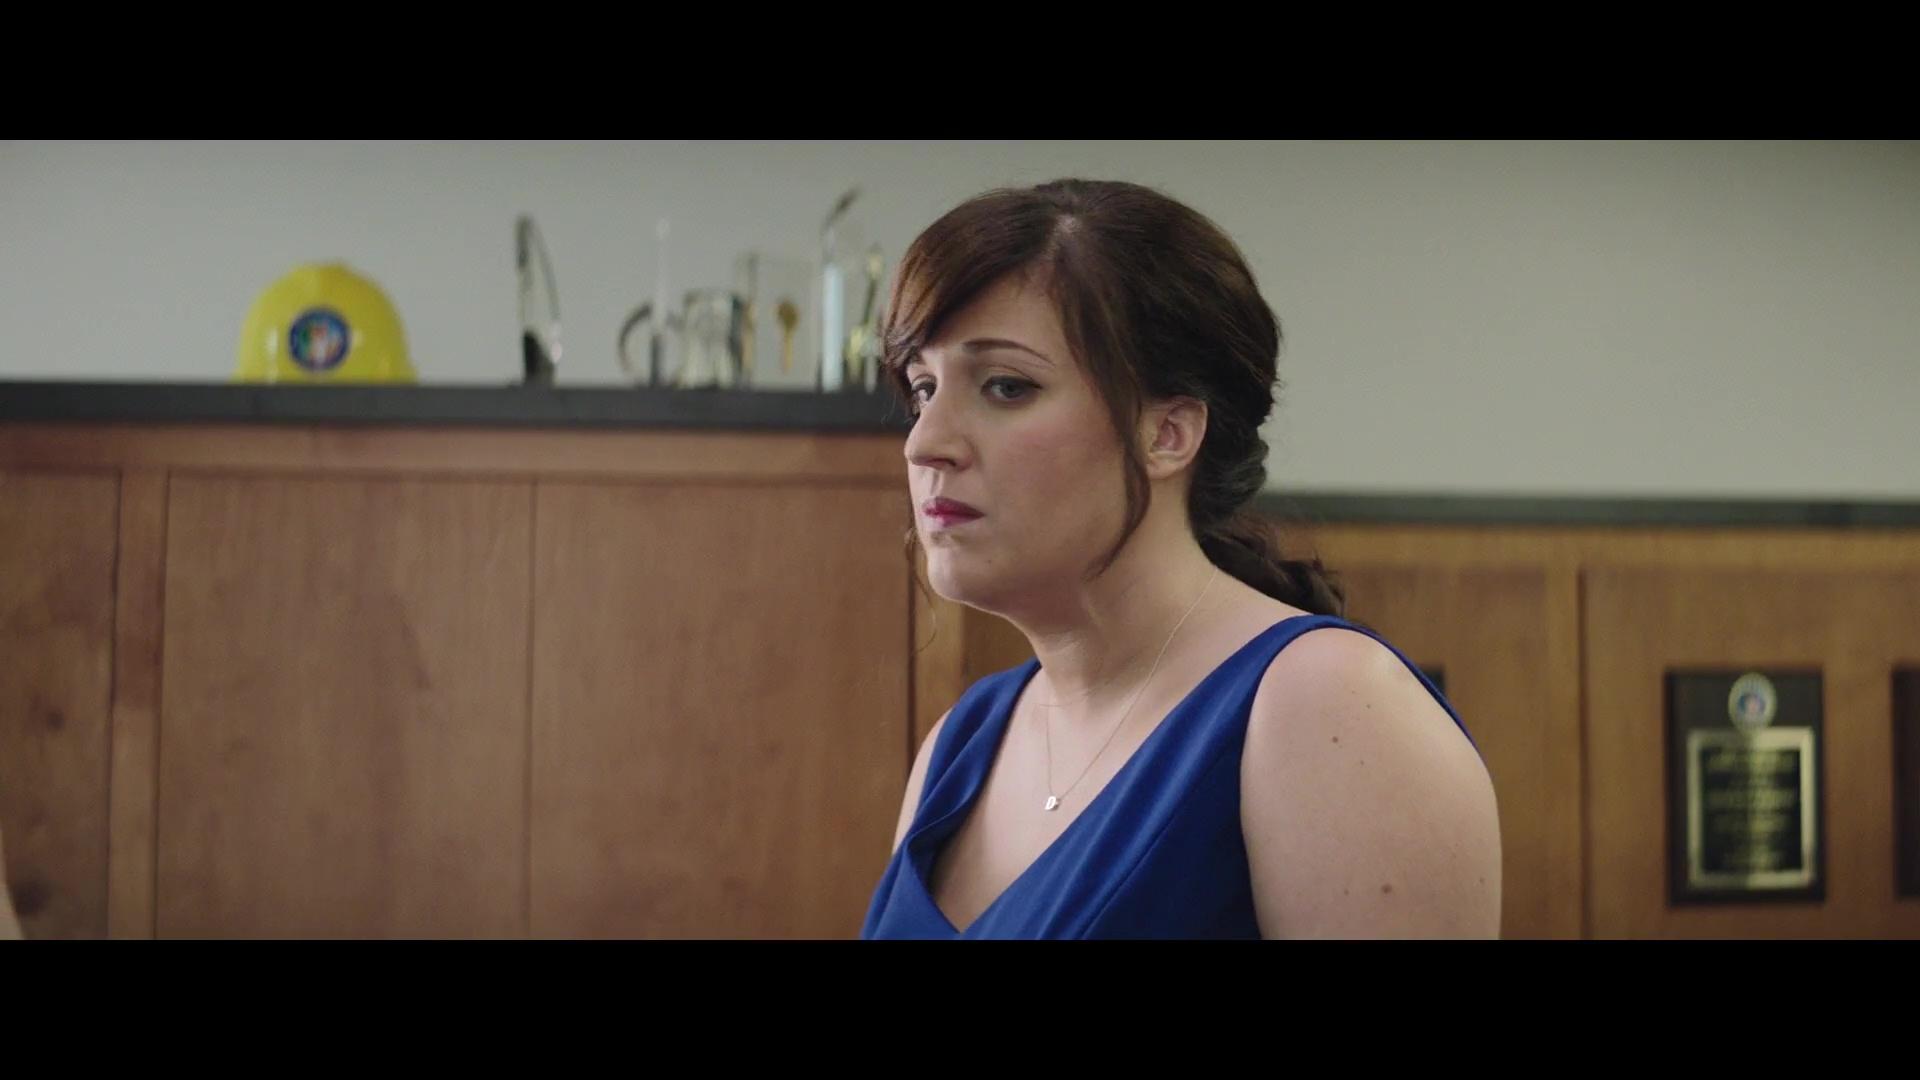 Operacion Casino 1080p Lat-Cast-Ing[Comedia](2017)